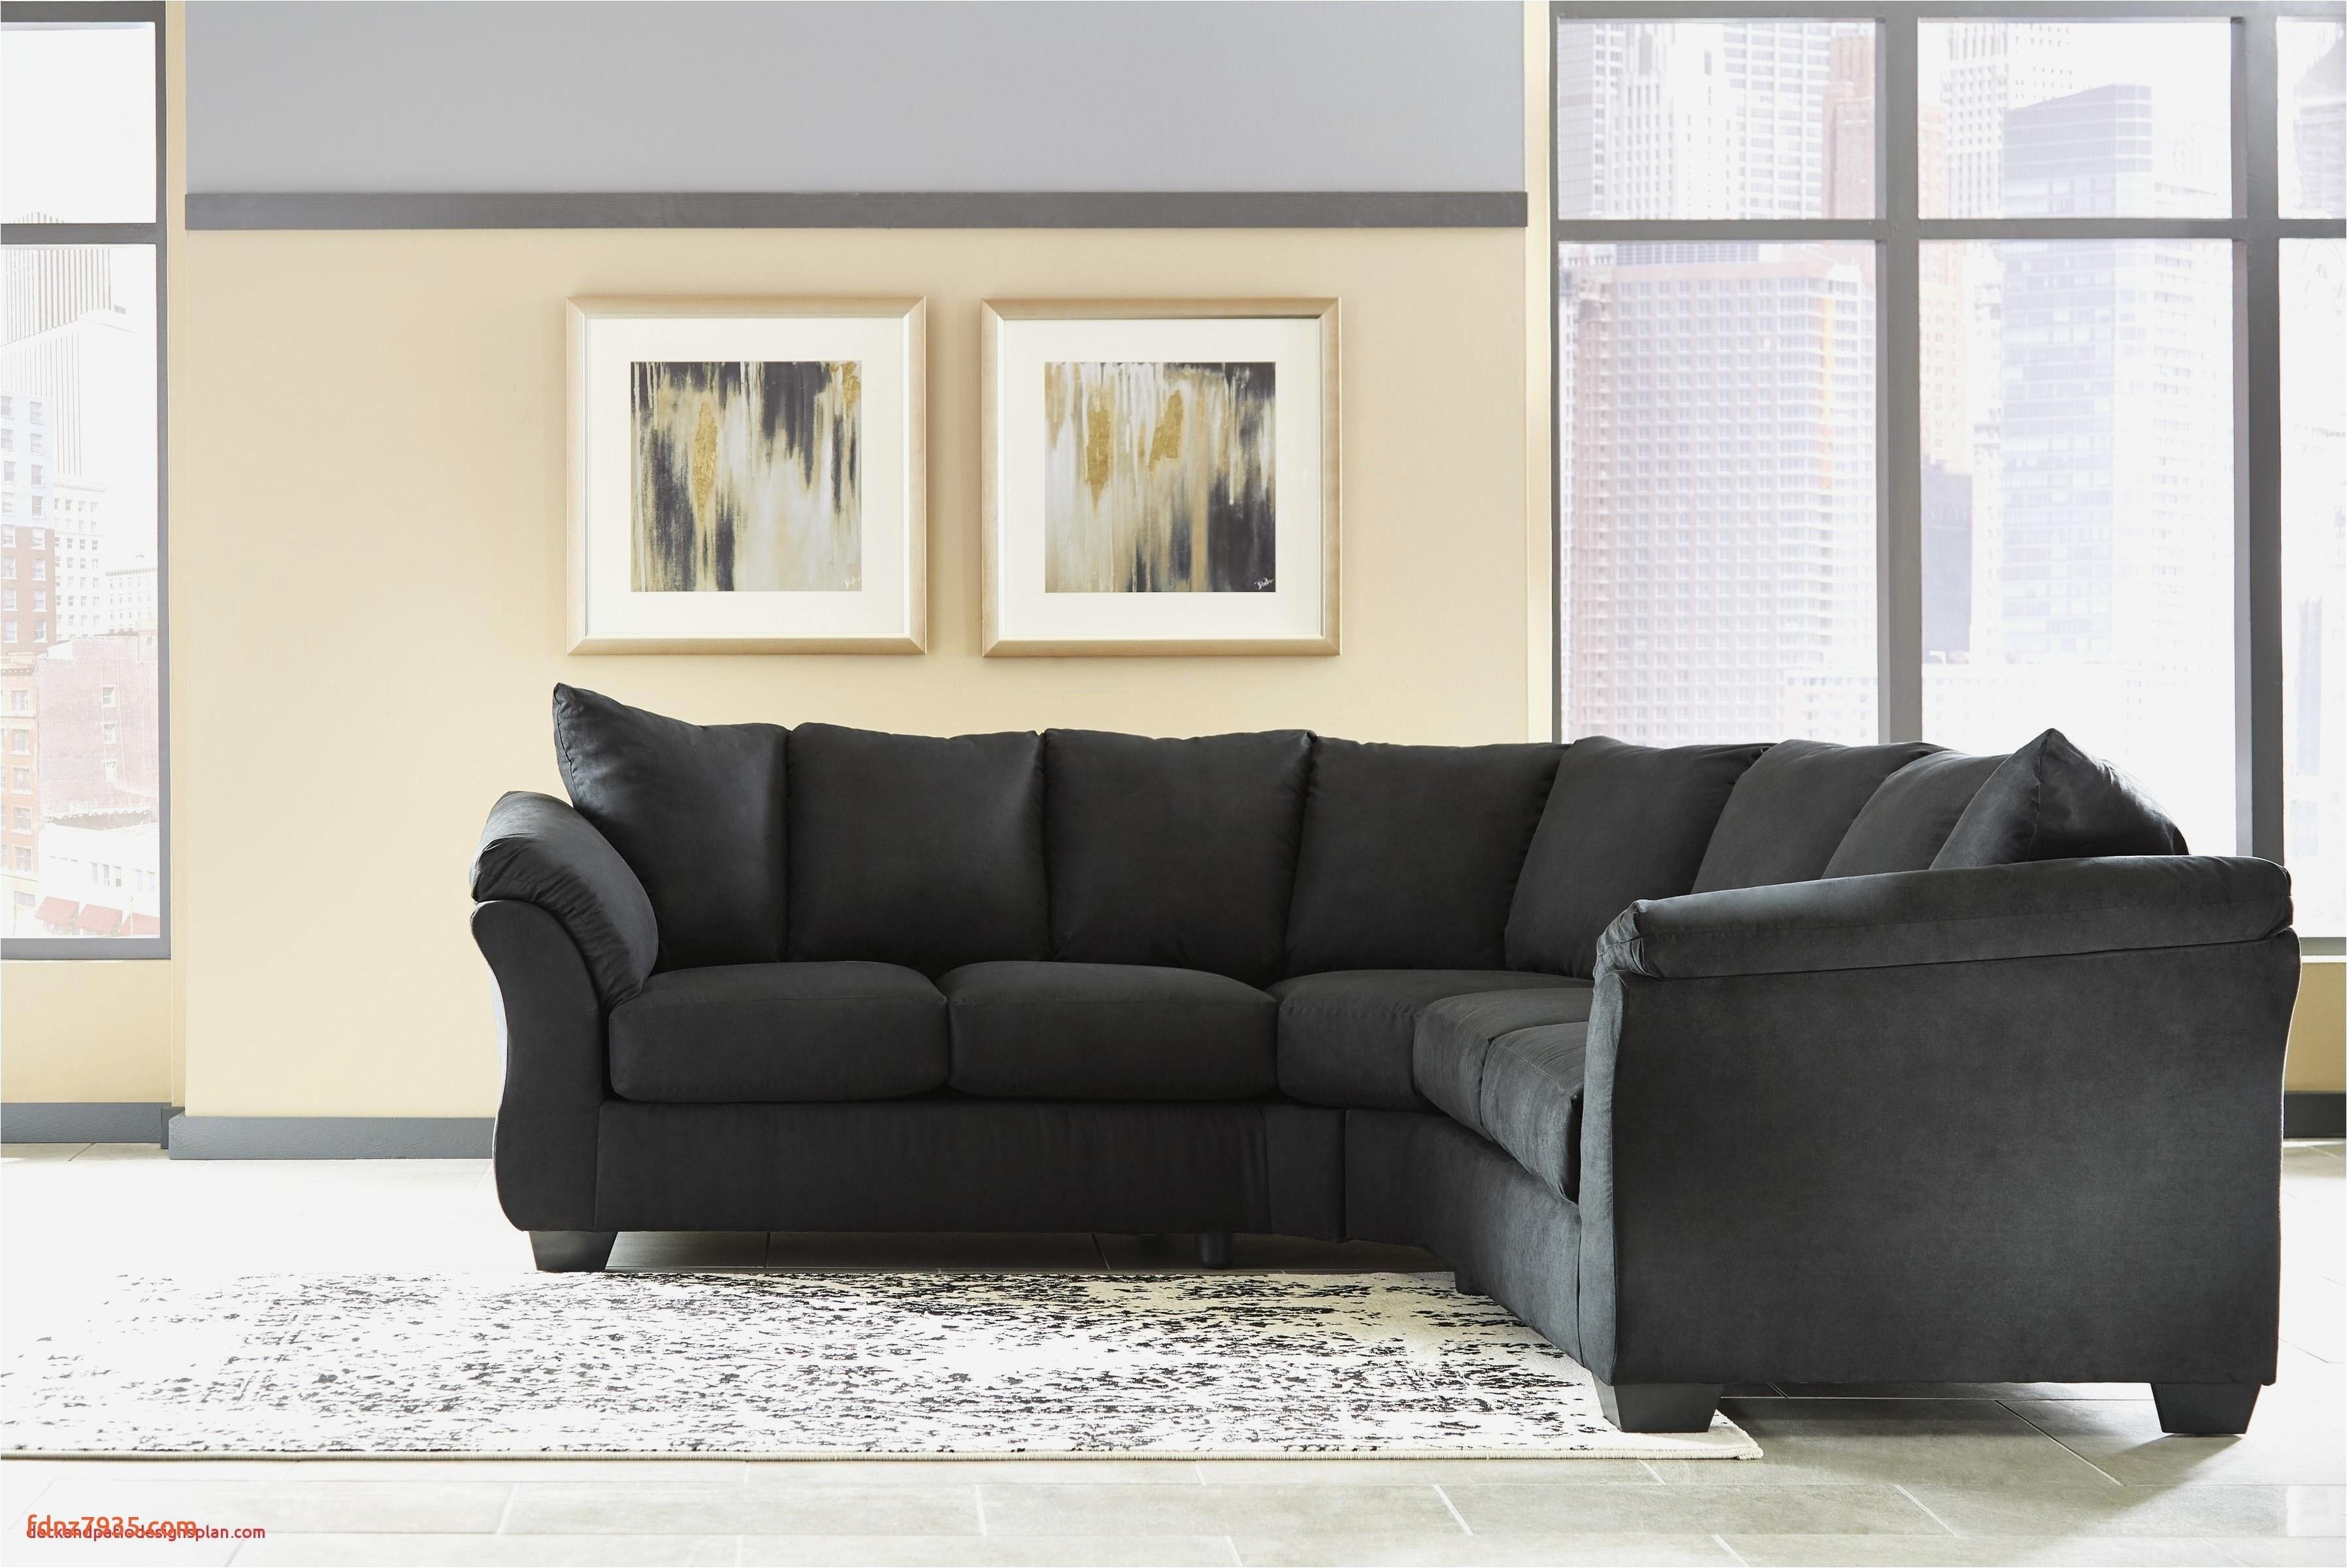 macys furniture bedroom sets fresh unique bedroom furniture stock of macys furniture bedroom sets fresh unique